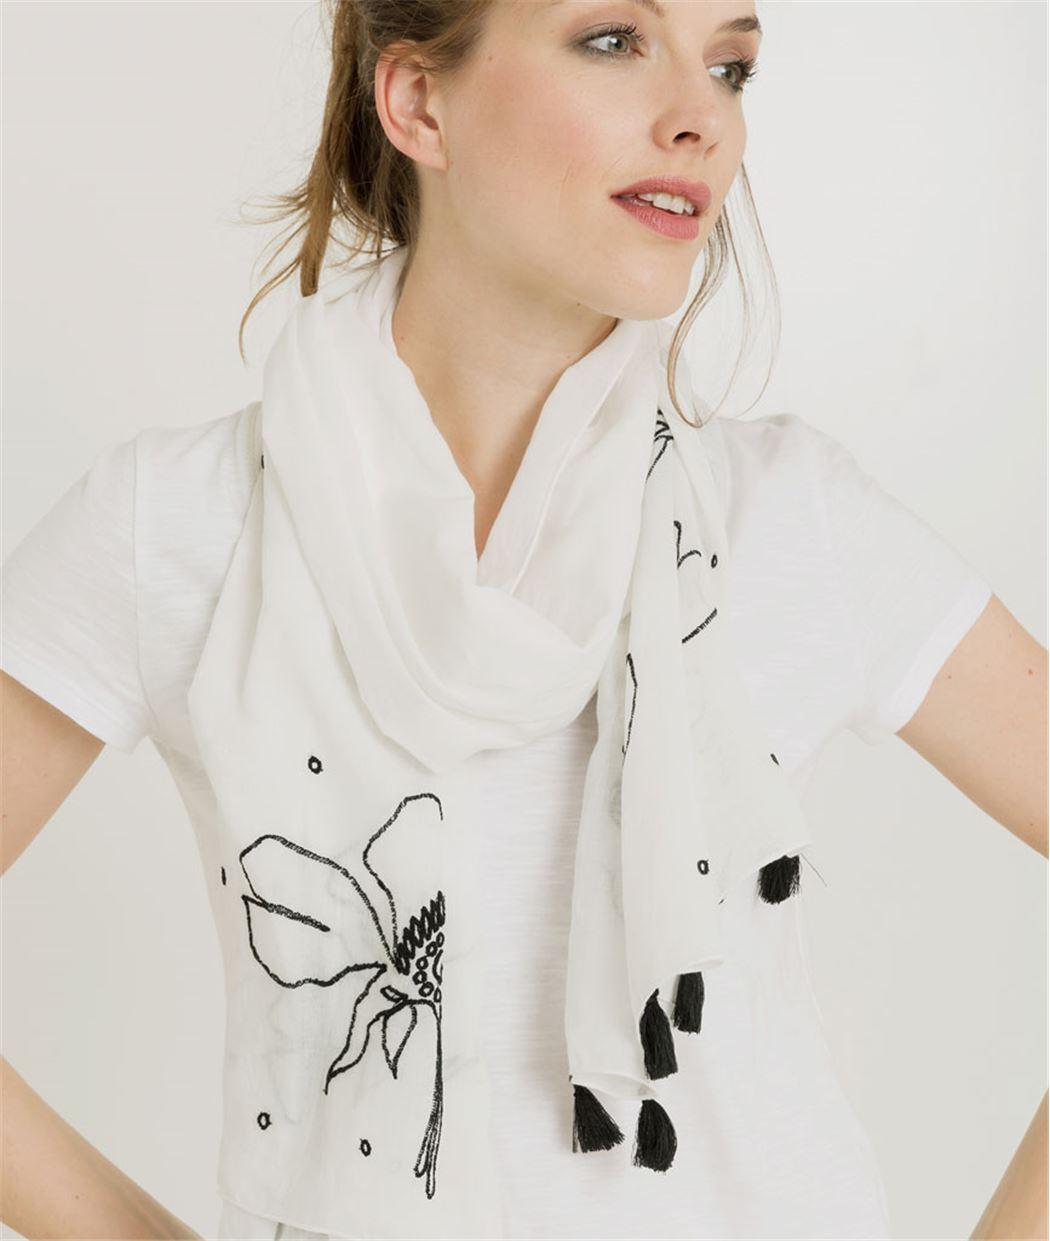 Foulard femme noir et blanc brodé BLANC